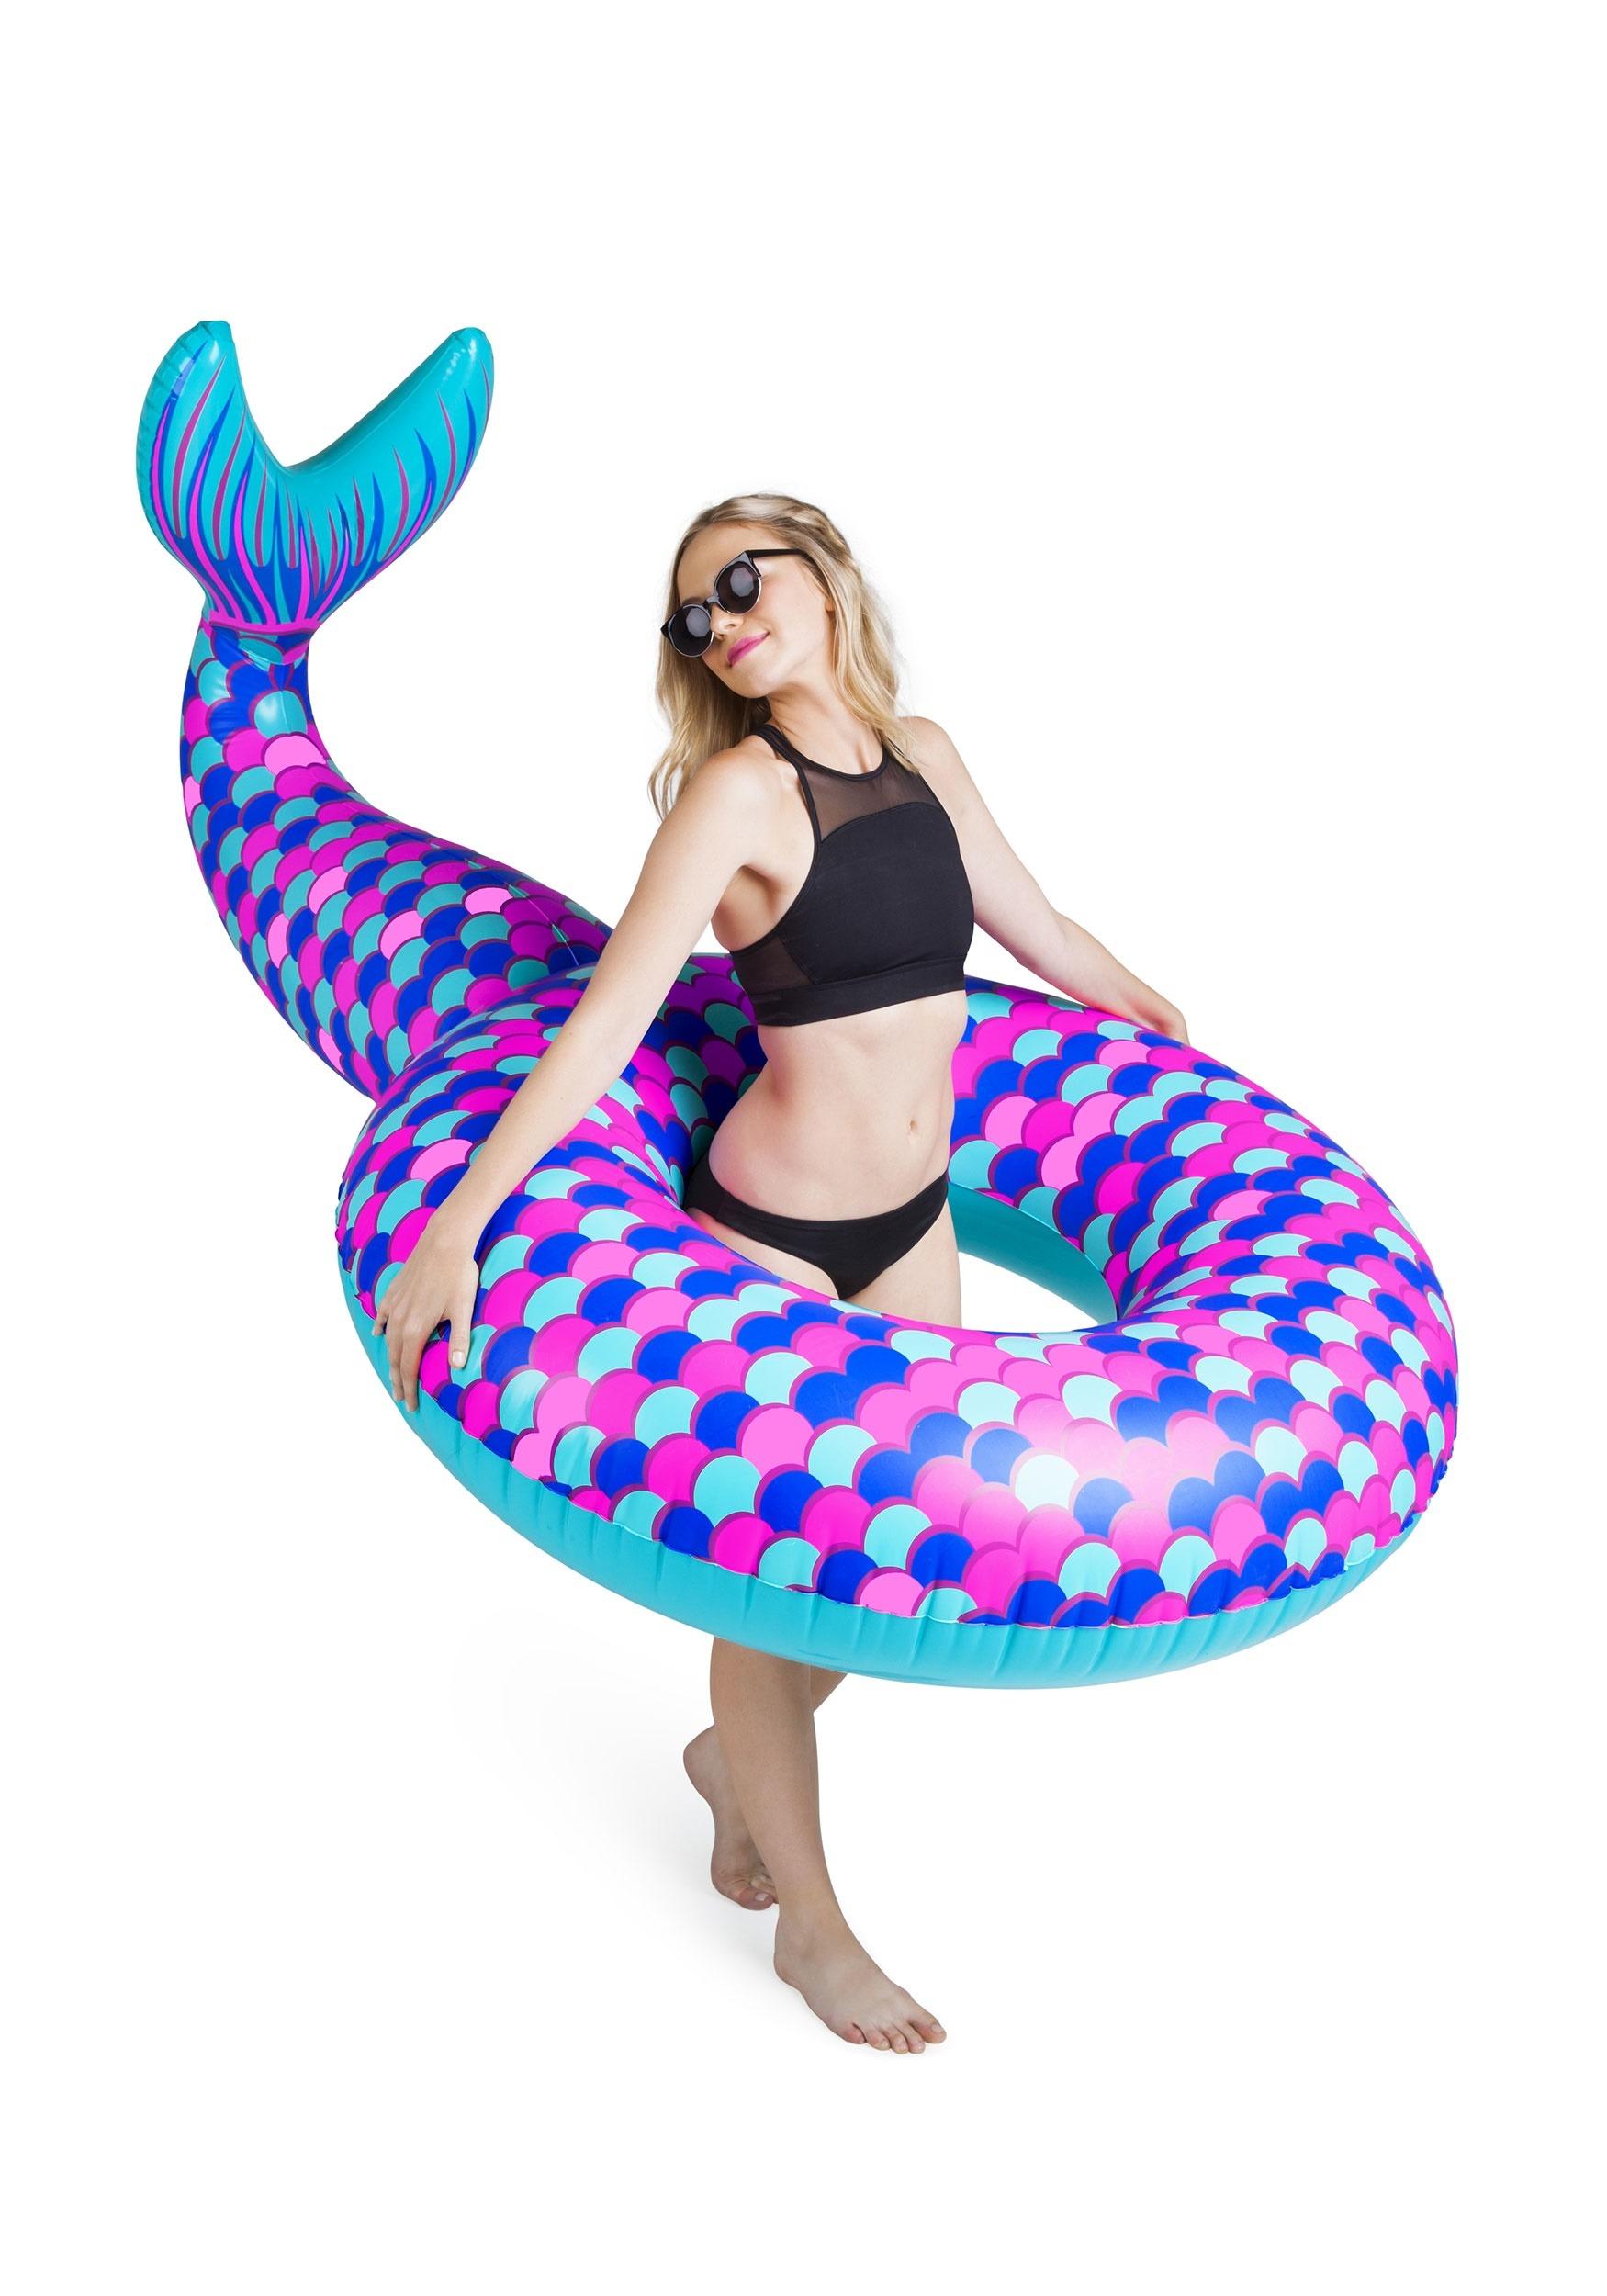 5ft Mermaid Tail Pool Float